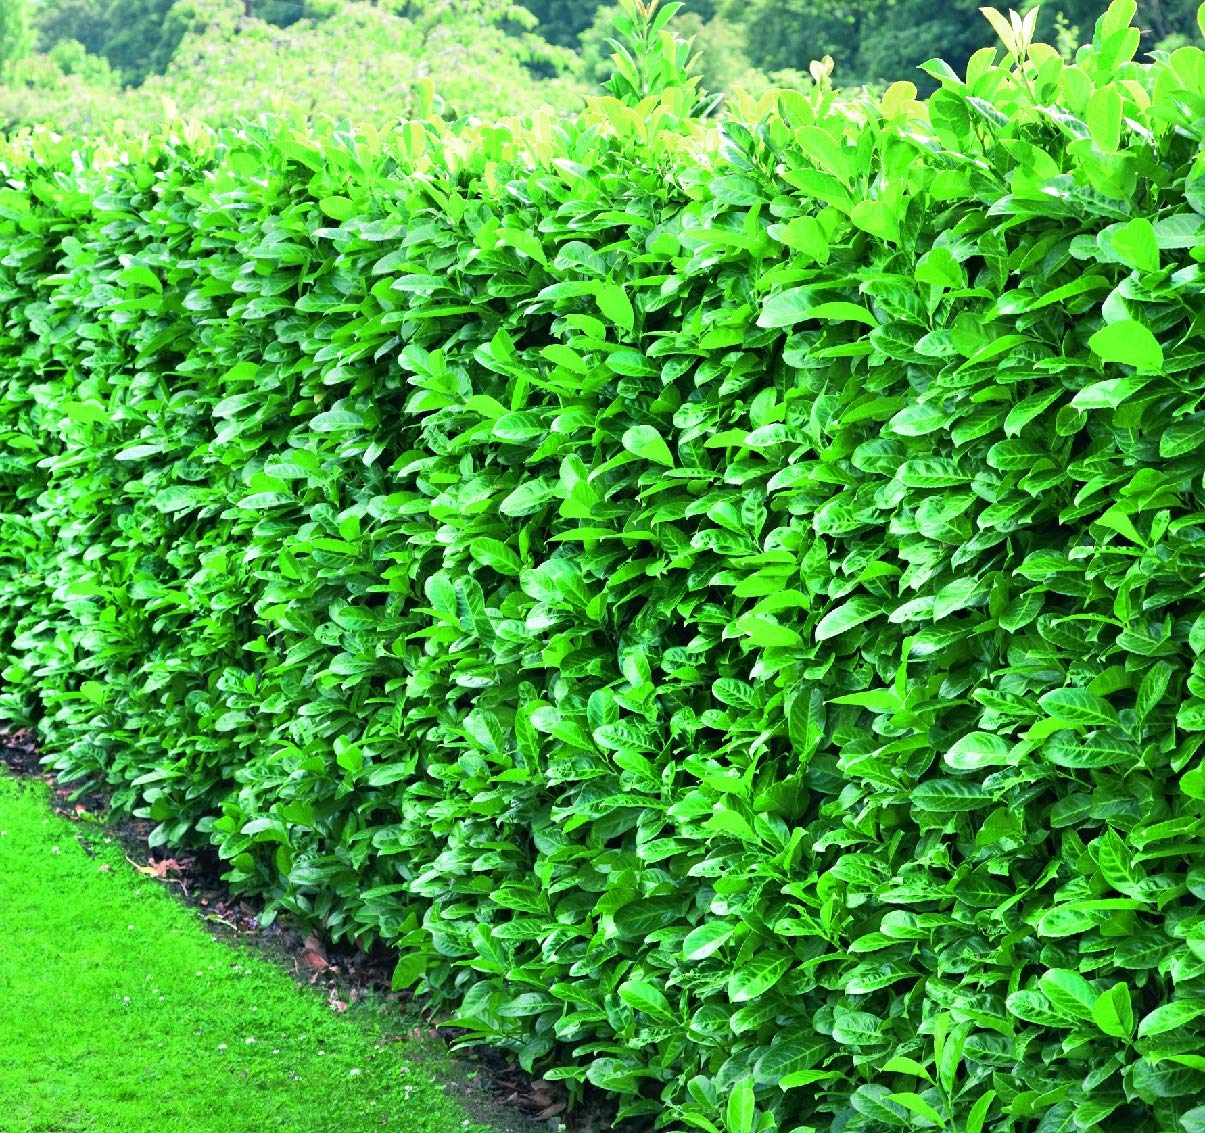 25 X PRUNUS /'ROTUNDIFOLIA/' CHERRY LAUREL EVERGREEN SHRUB GARDEN PLANT IN POT